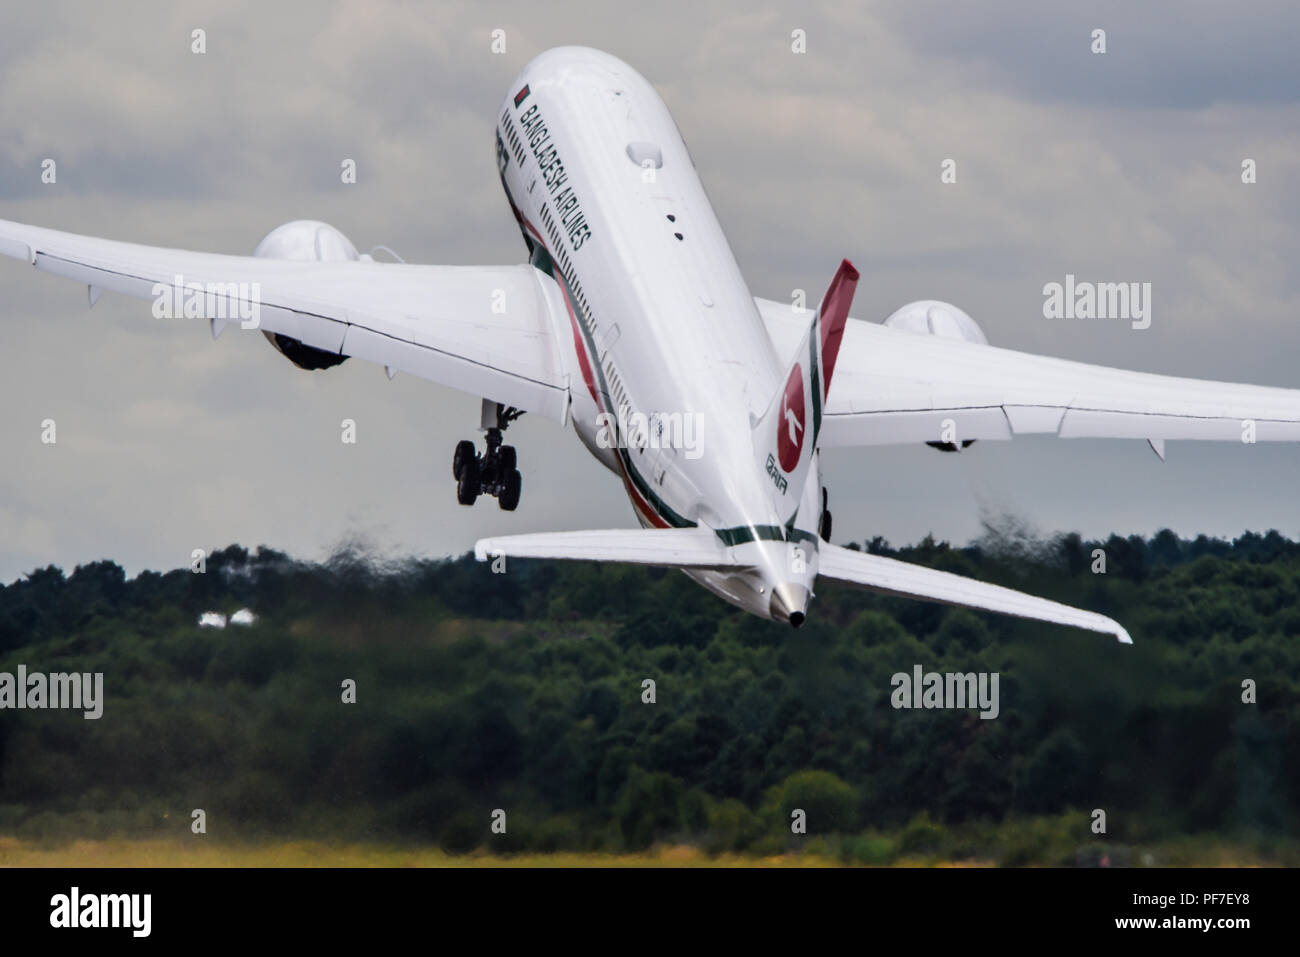 Bangladesh Airlines Boeing 787 Dreamliner at the Farnborough International Airshow FIA, aviation, aerospace trade show - Stock Image